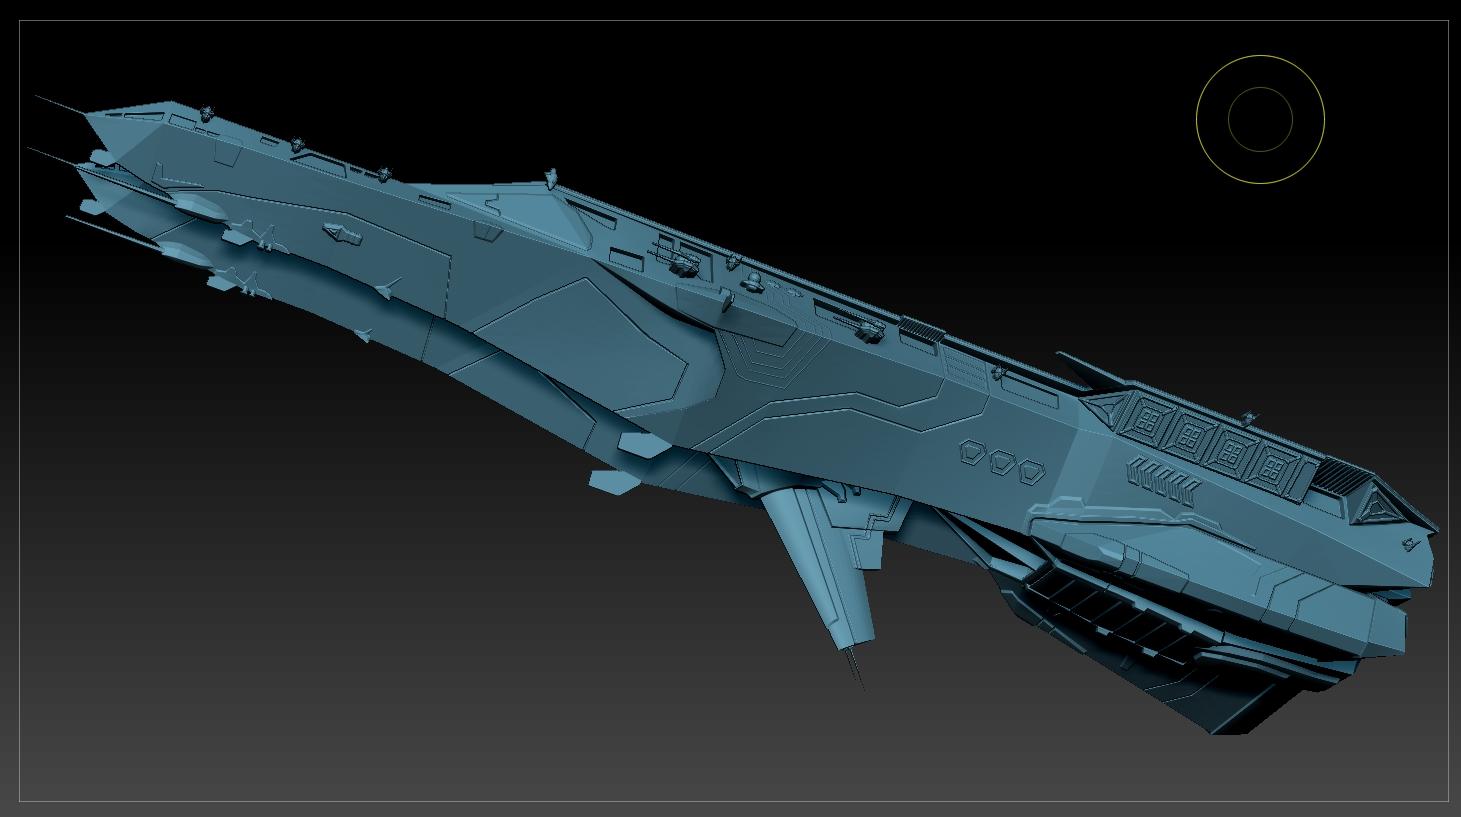 Uraga Class Carrier Img 4 01